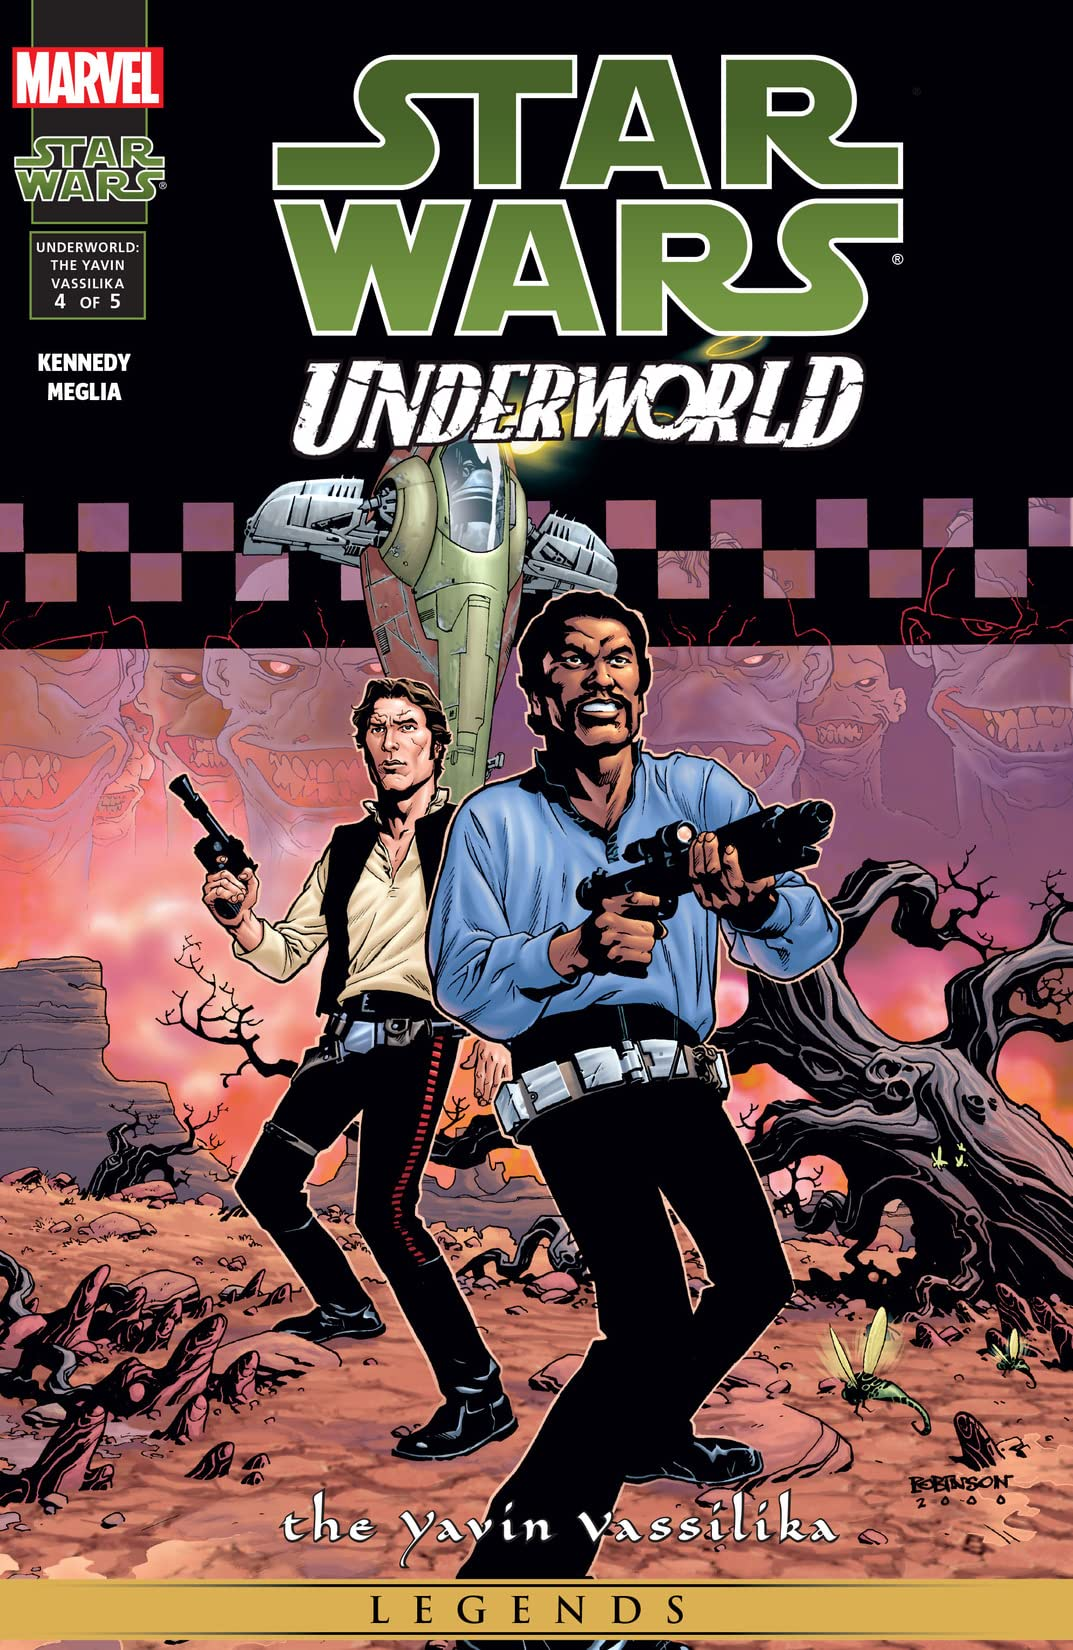 Star Wars: Underworld - The Yavin Vassilika (2000-2001) #4 (of 5)